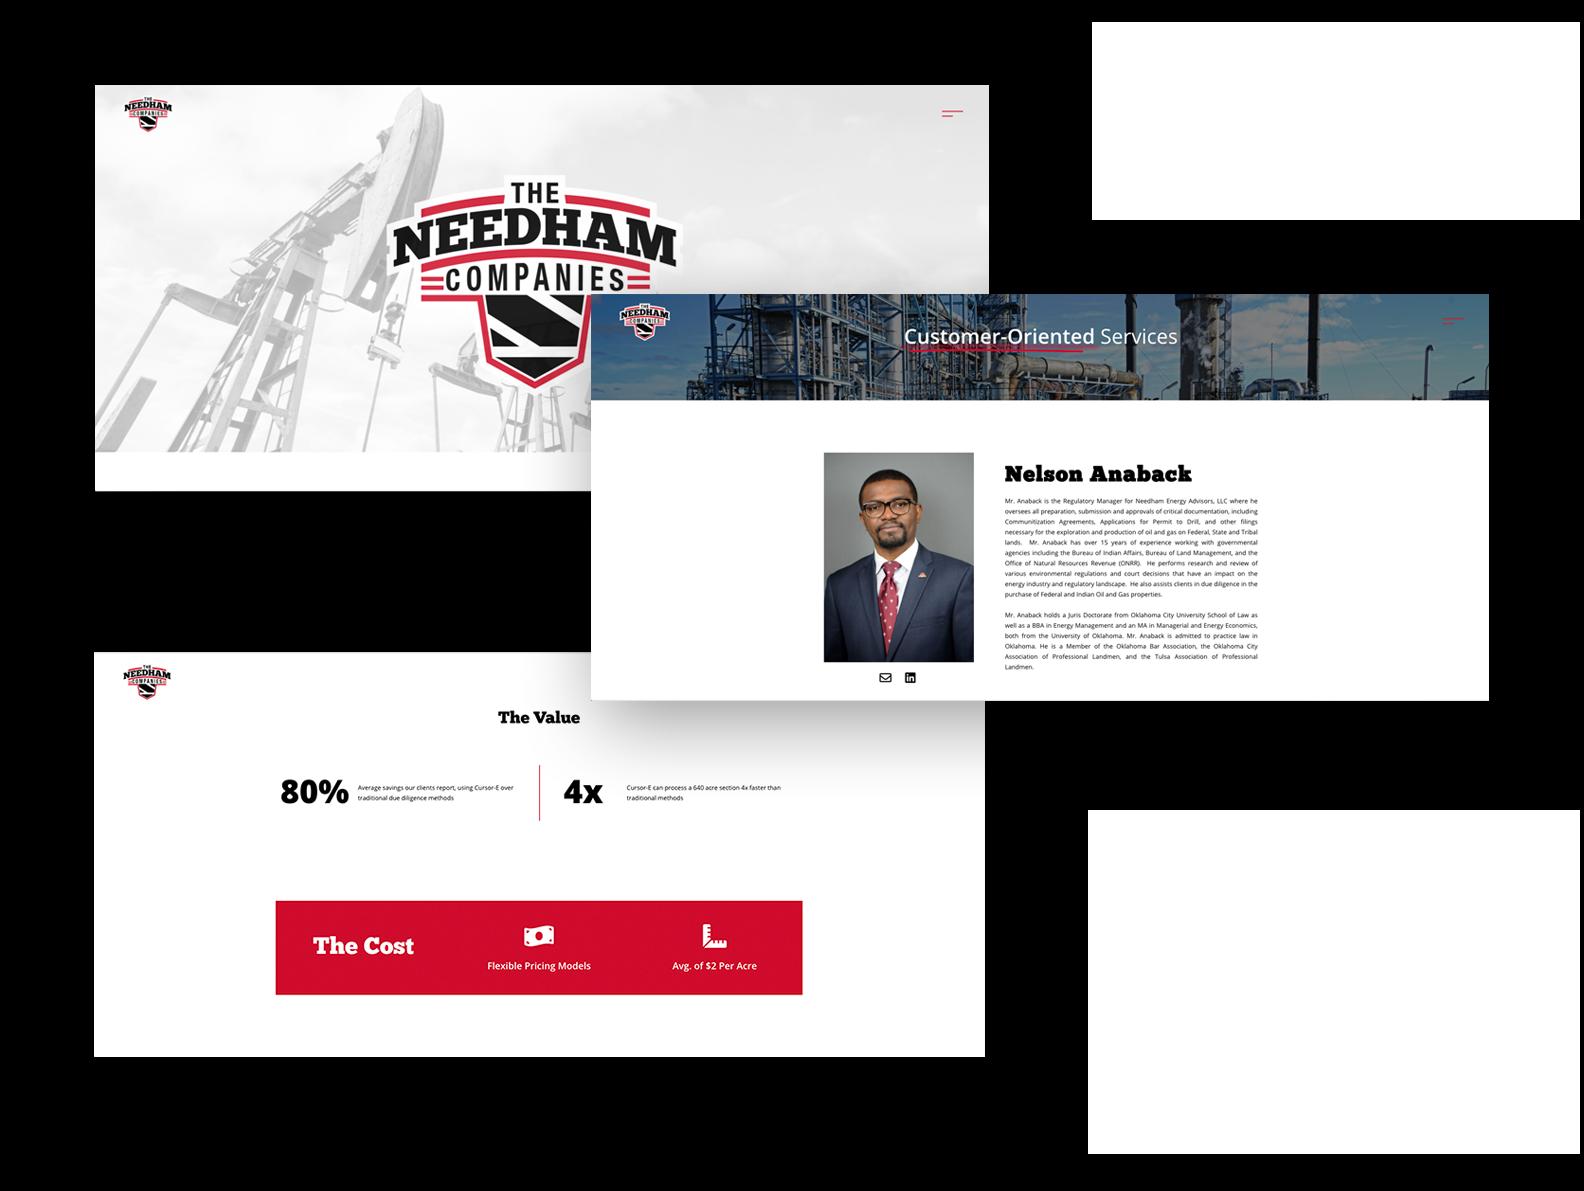 needham company website pages